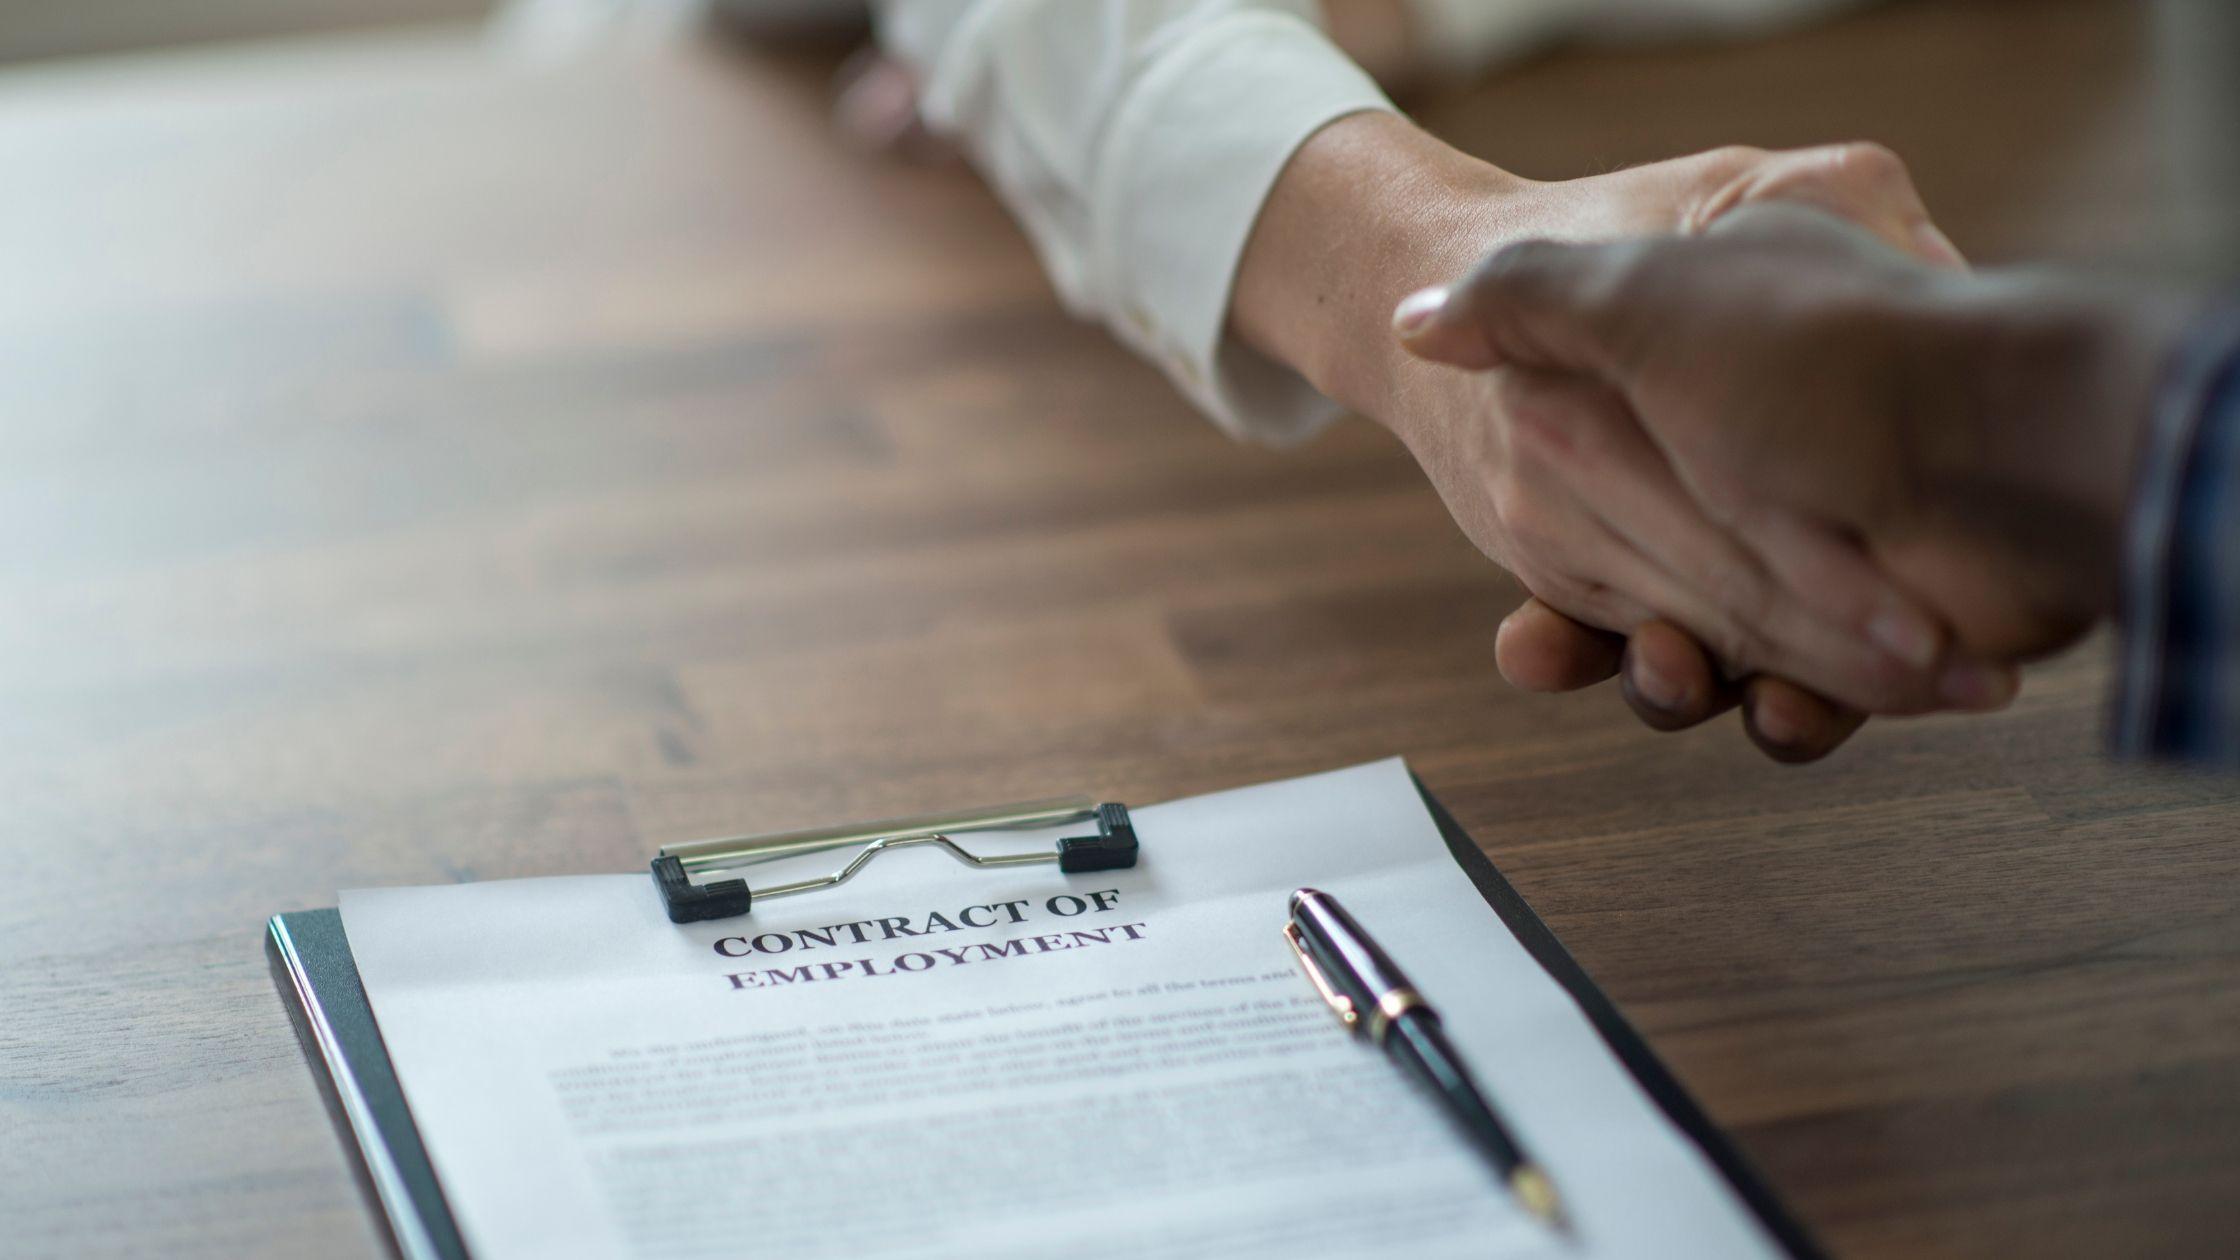 4 Strategies For Promoting Job Openings Online